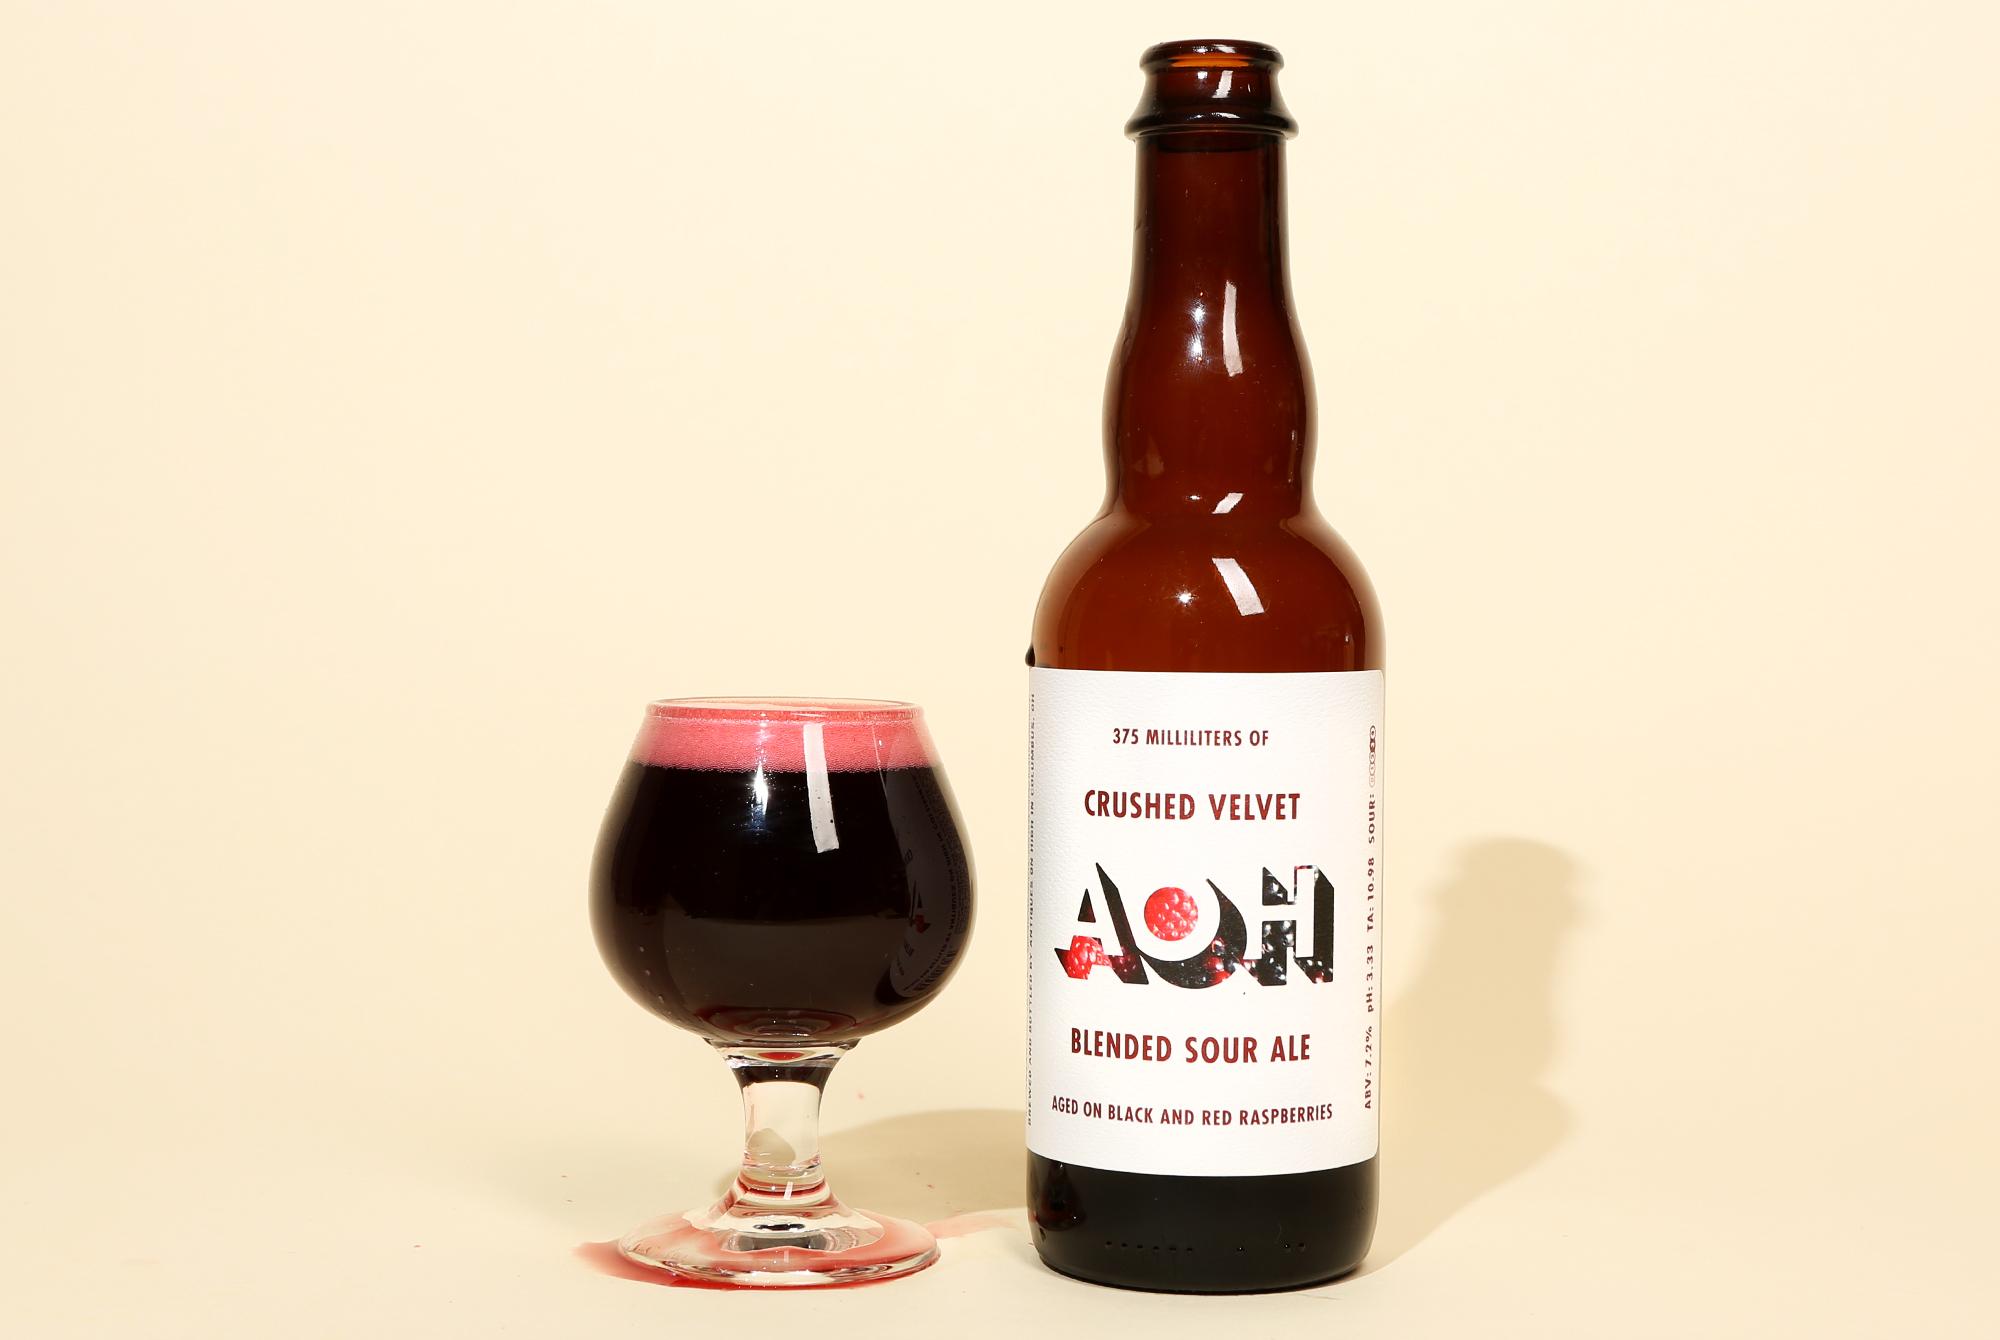 seventh son blended sour ale